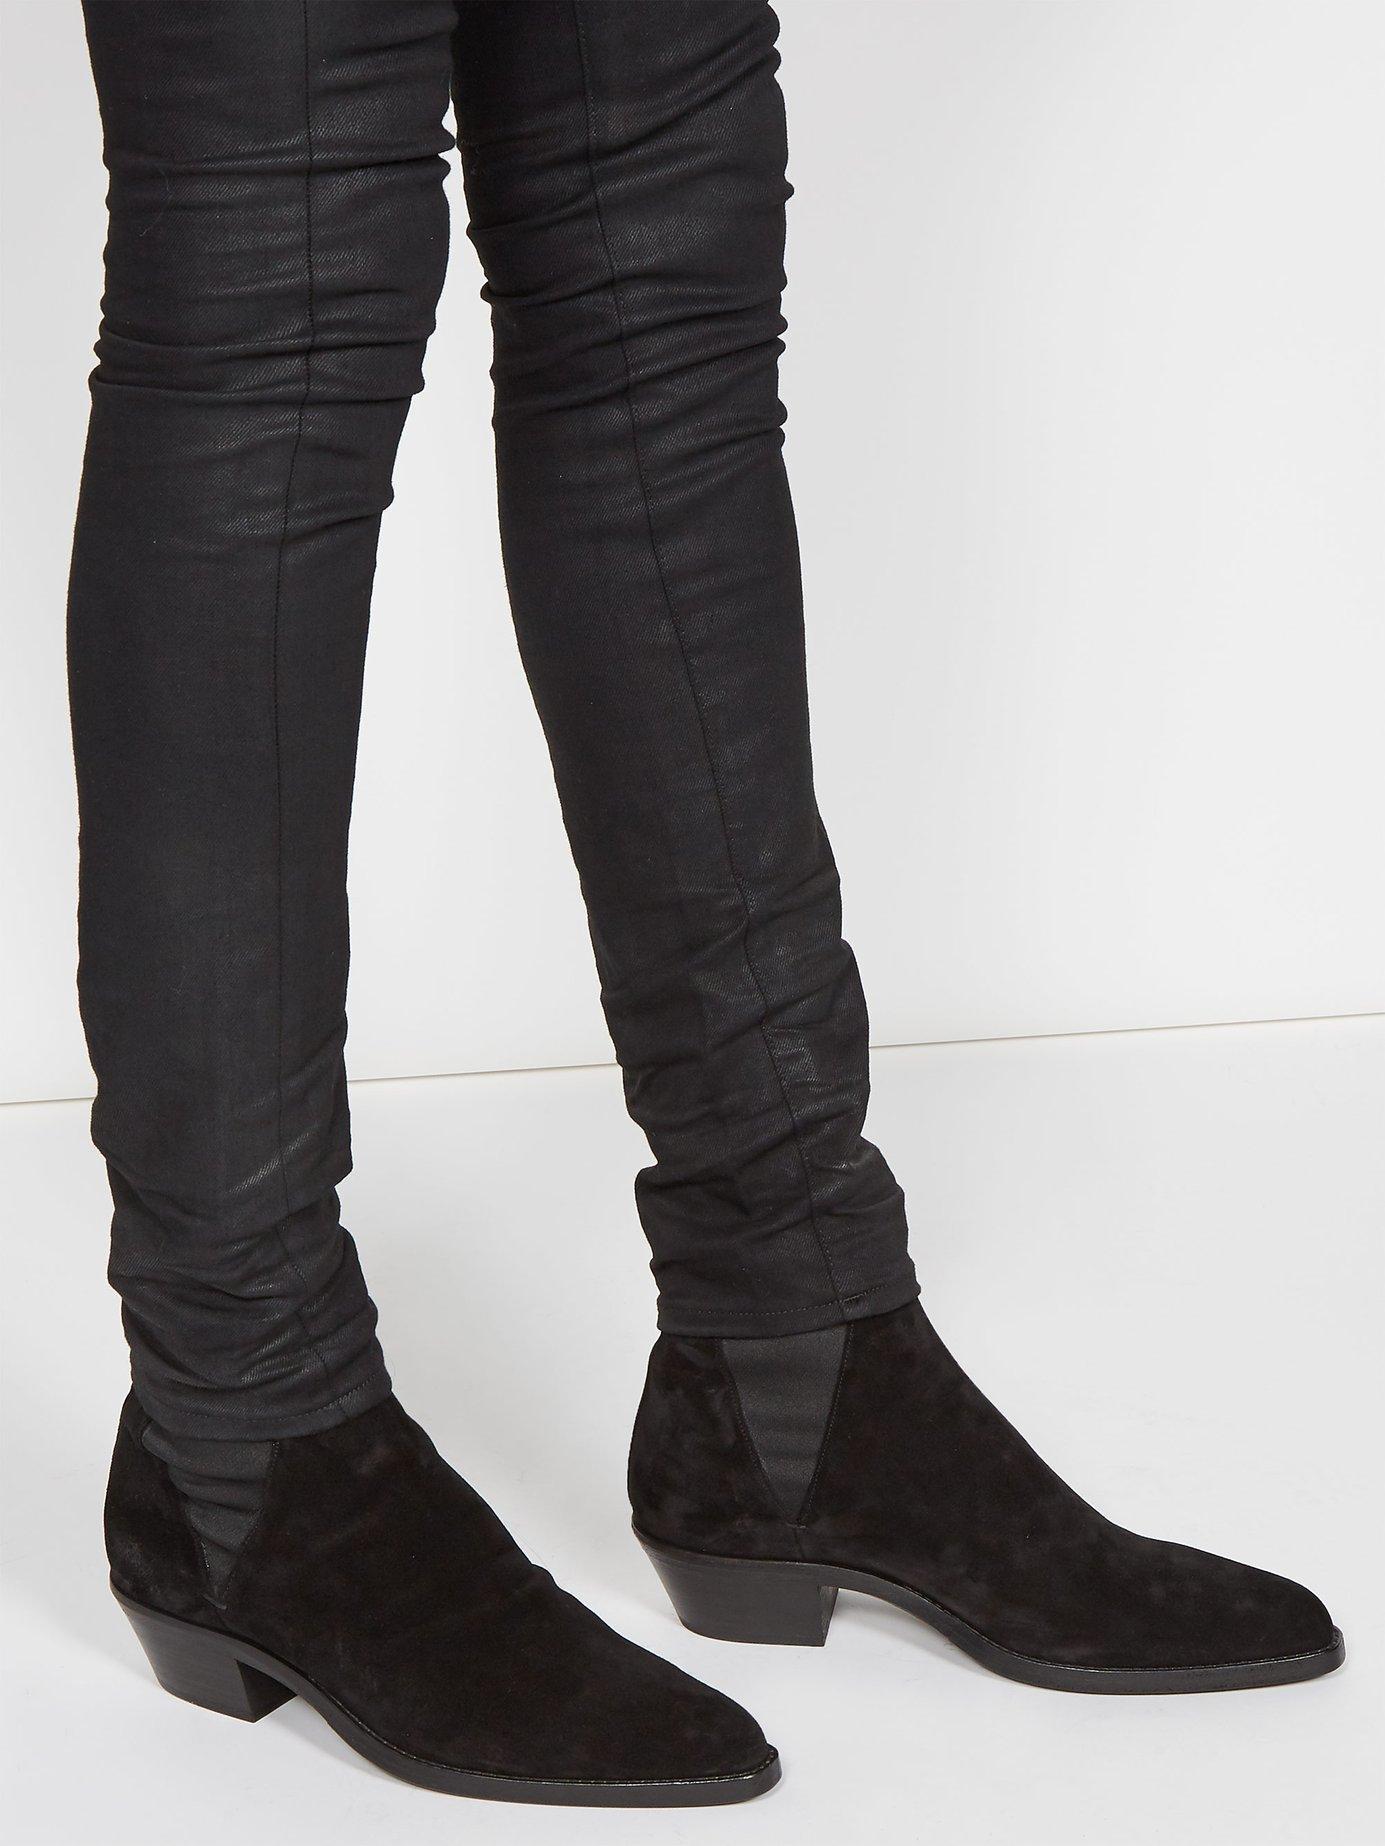 975992d7032 Men's Black Dakota Suede Chelsea Boots